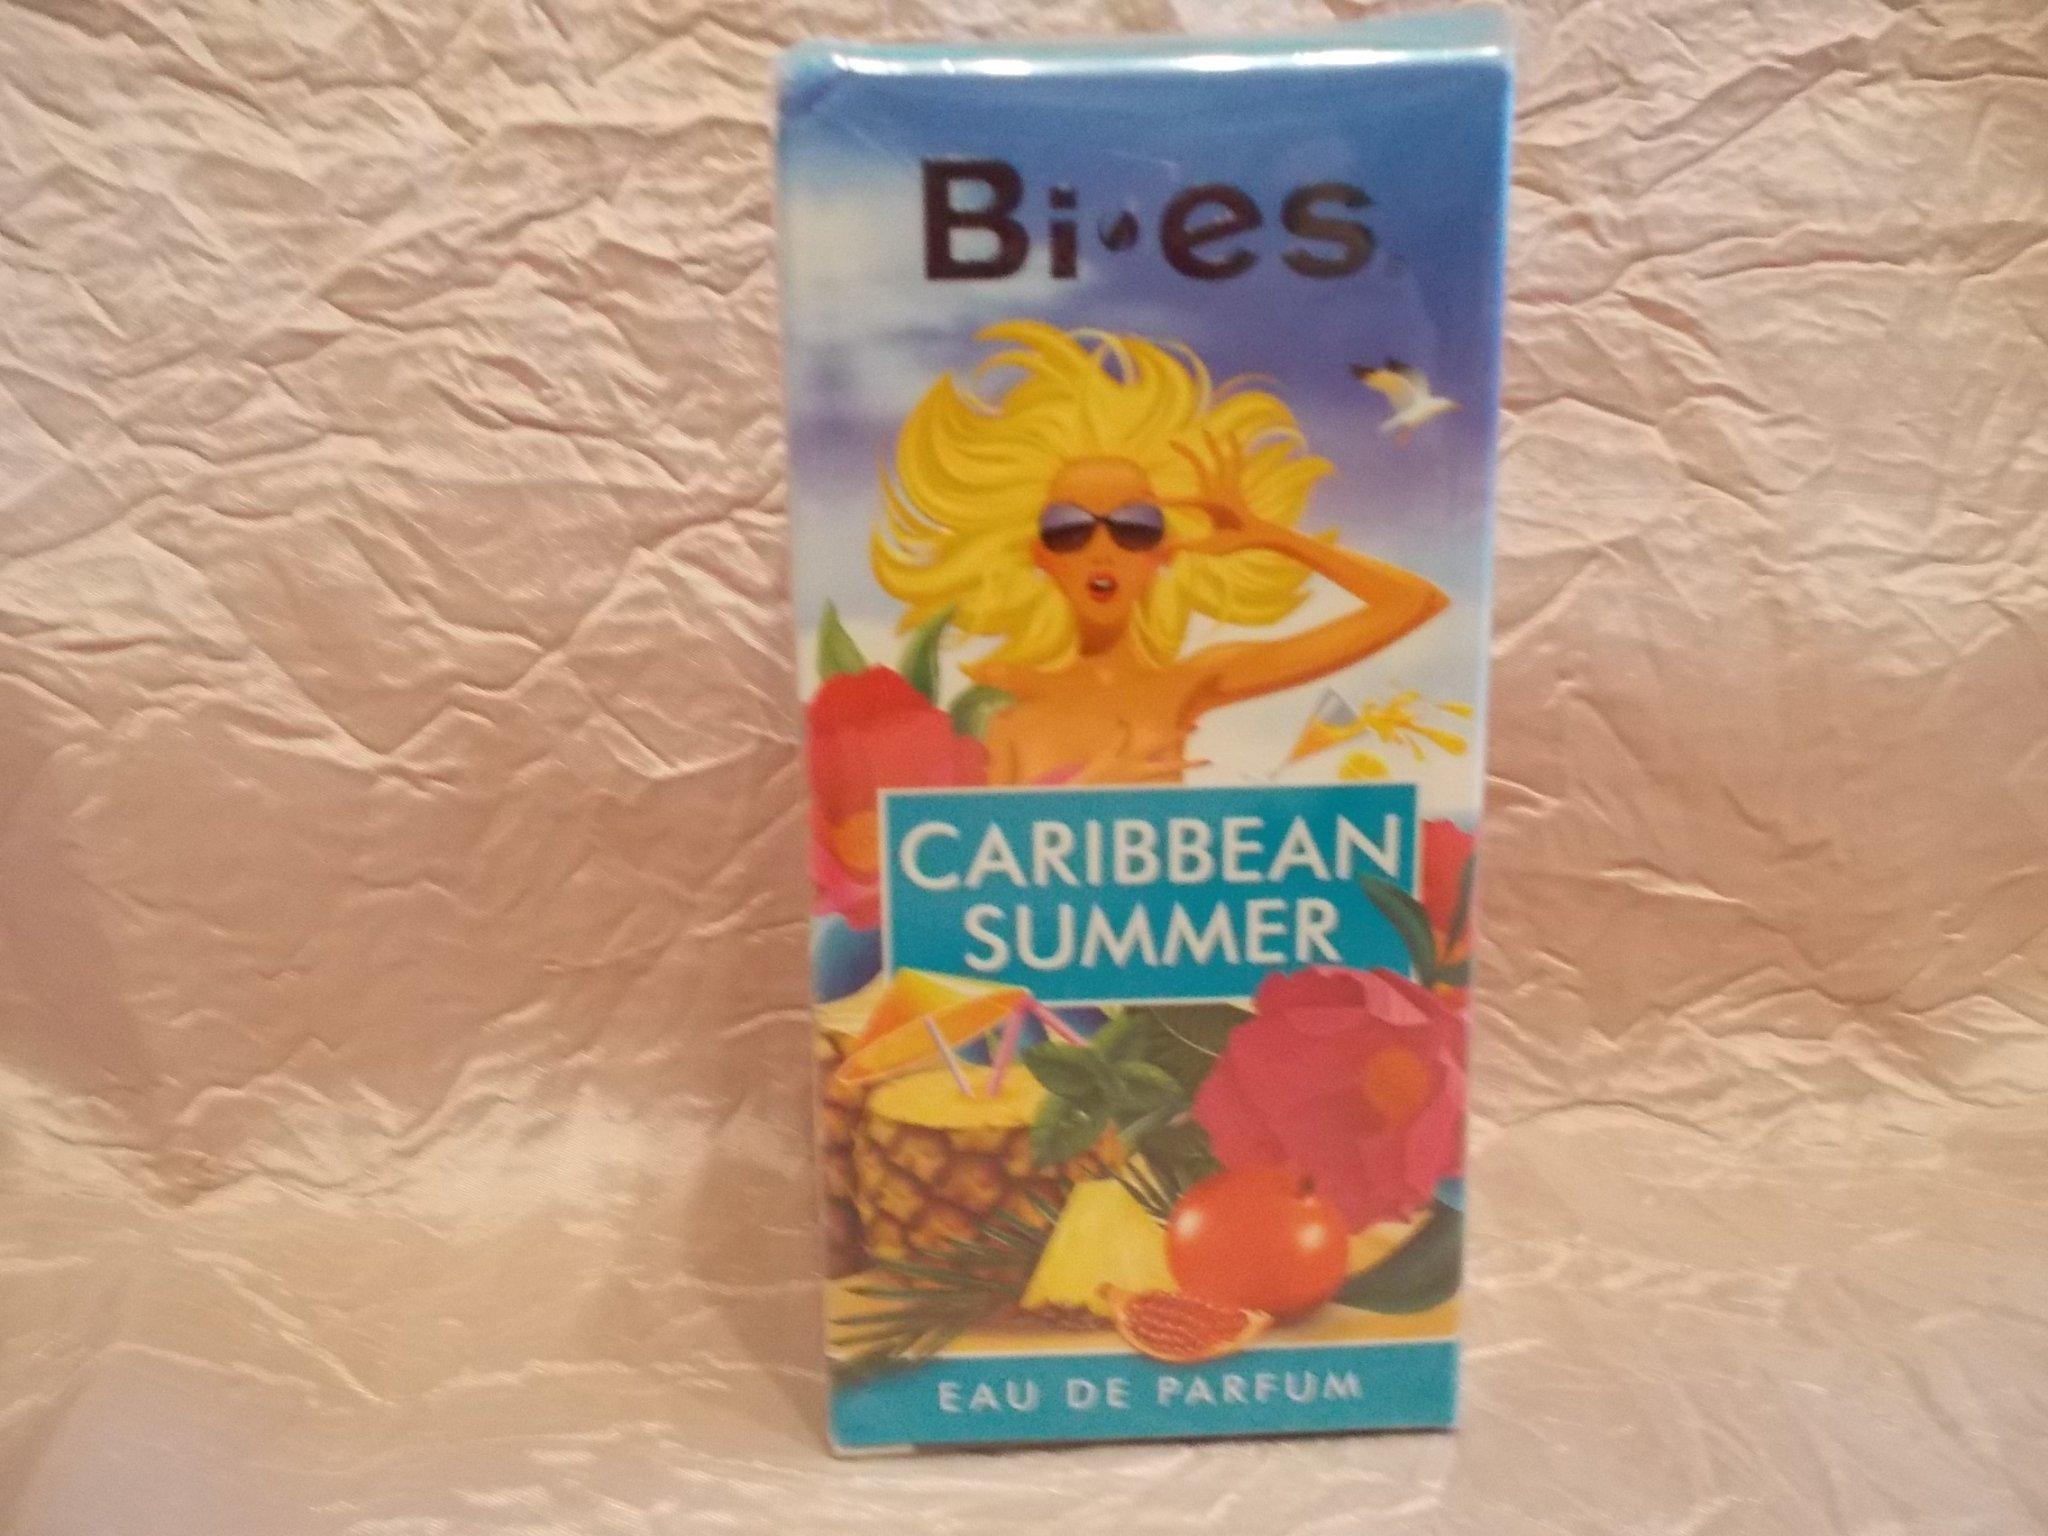 Parfym Bi es Caribbean summer 50 ml. (387271891) ᐈ Köp på